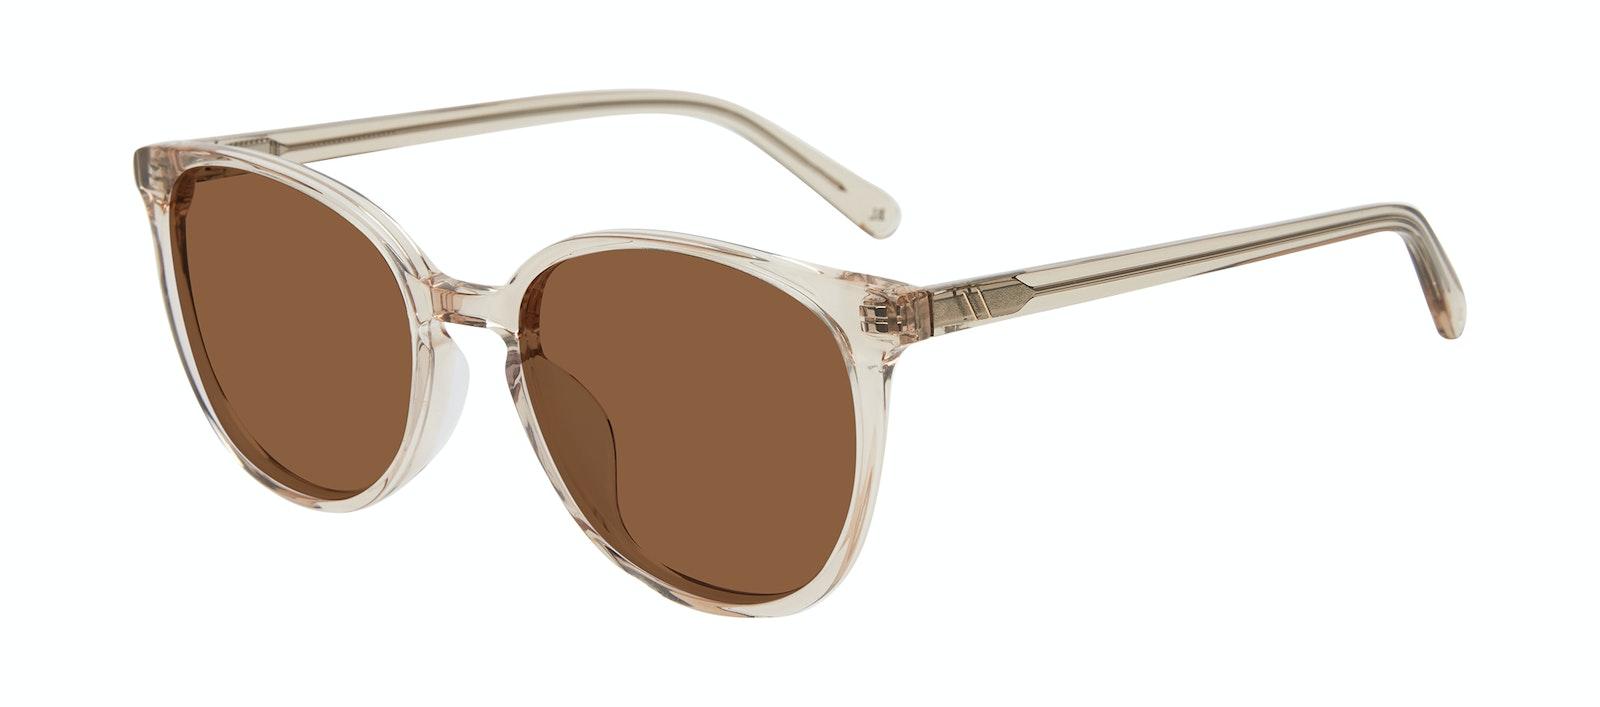 Affordable Fashion Glasses Round Sunglasses Women Impression Blond Tilt